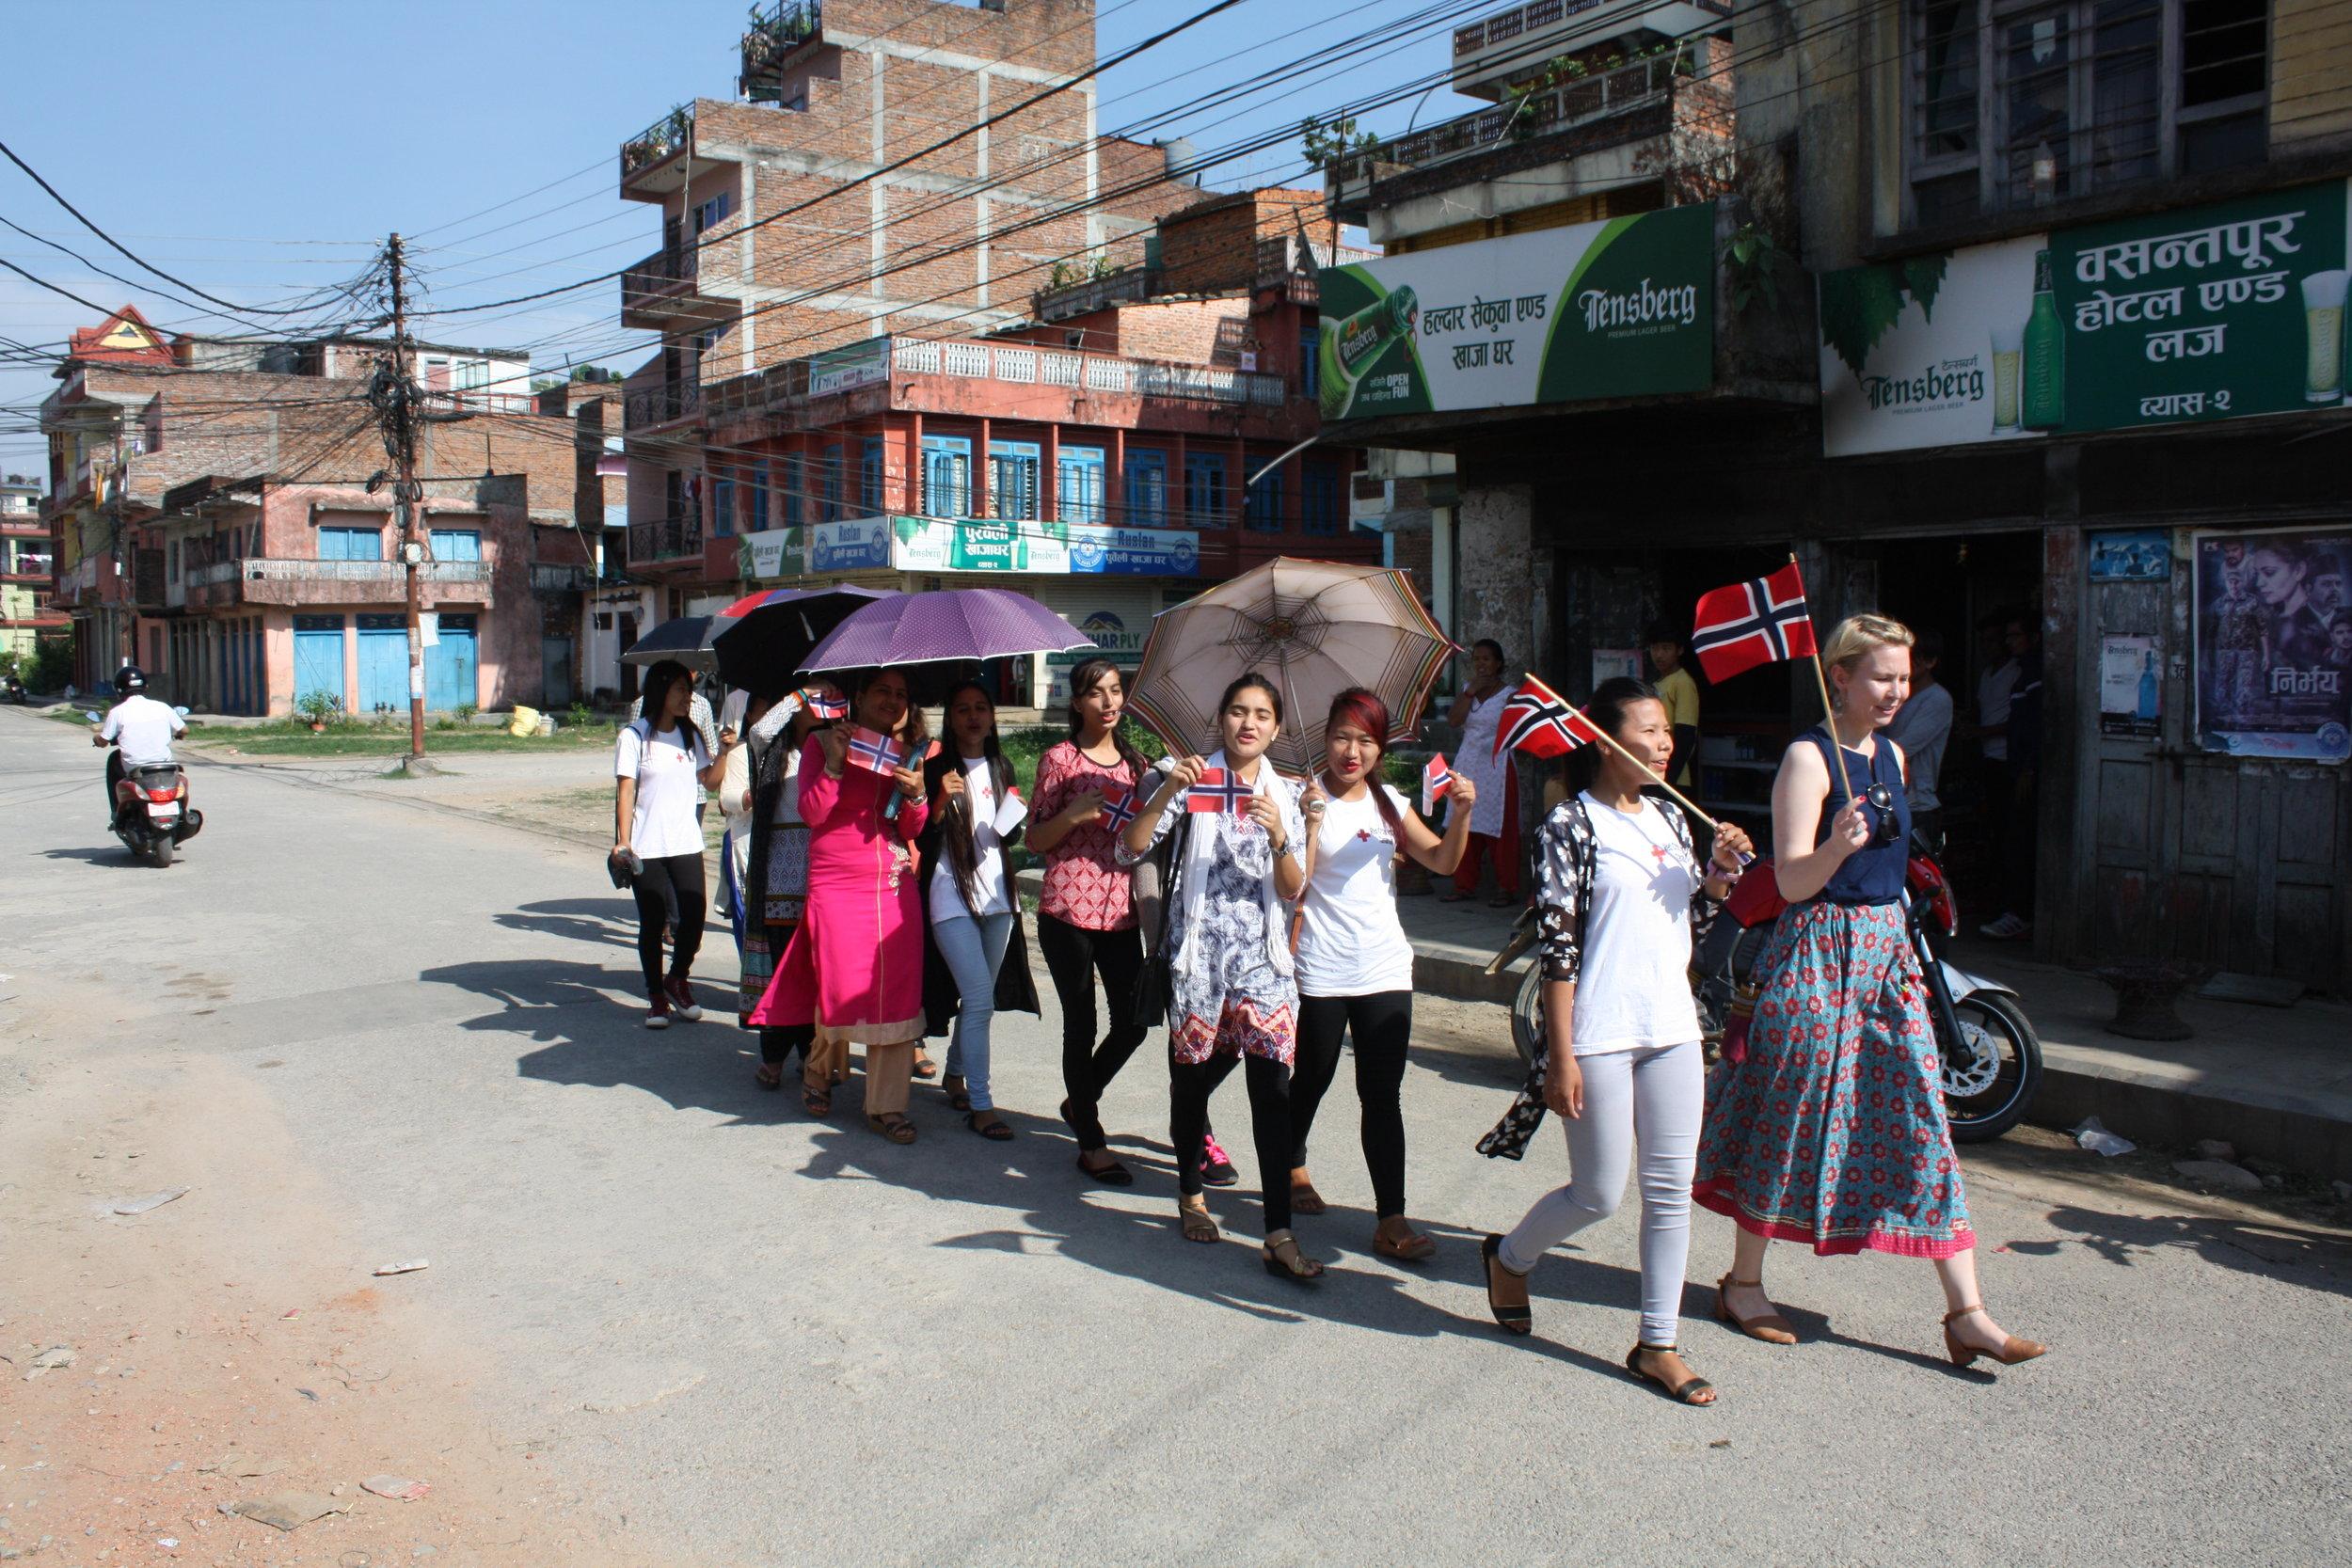 17th of May parade in Damauli, Nepal. Photo: Ola Opdal.